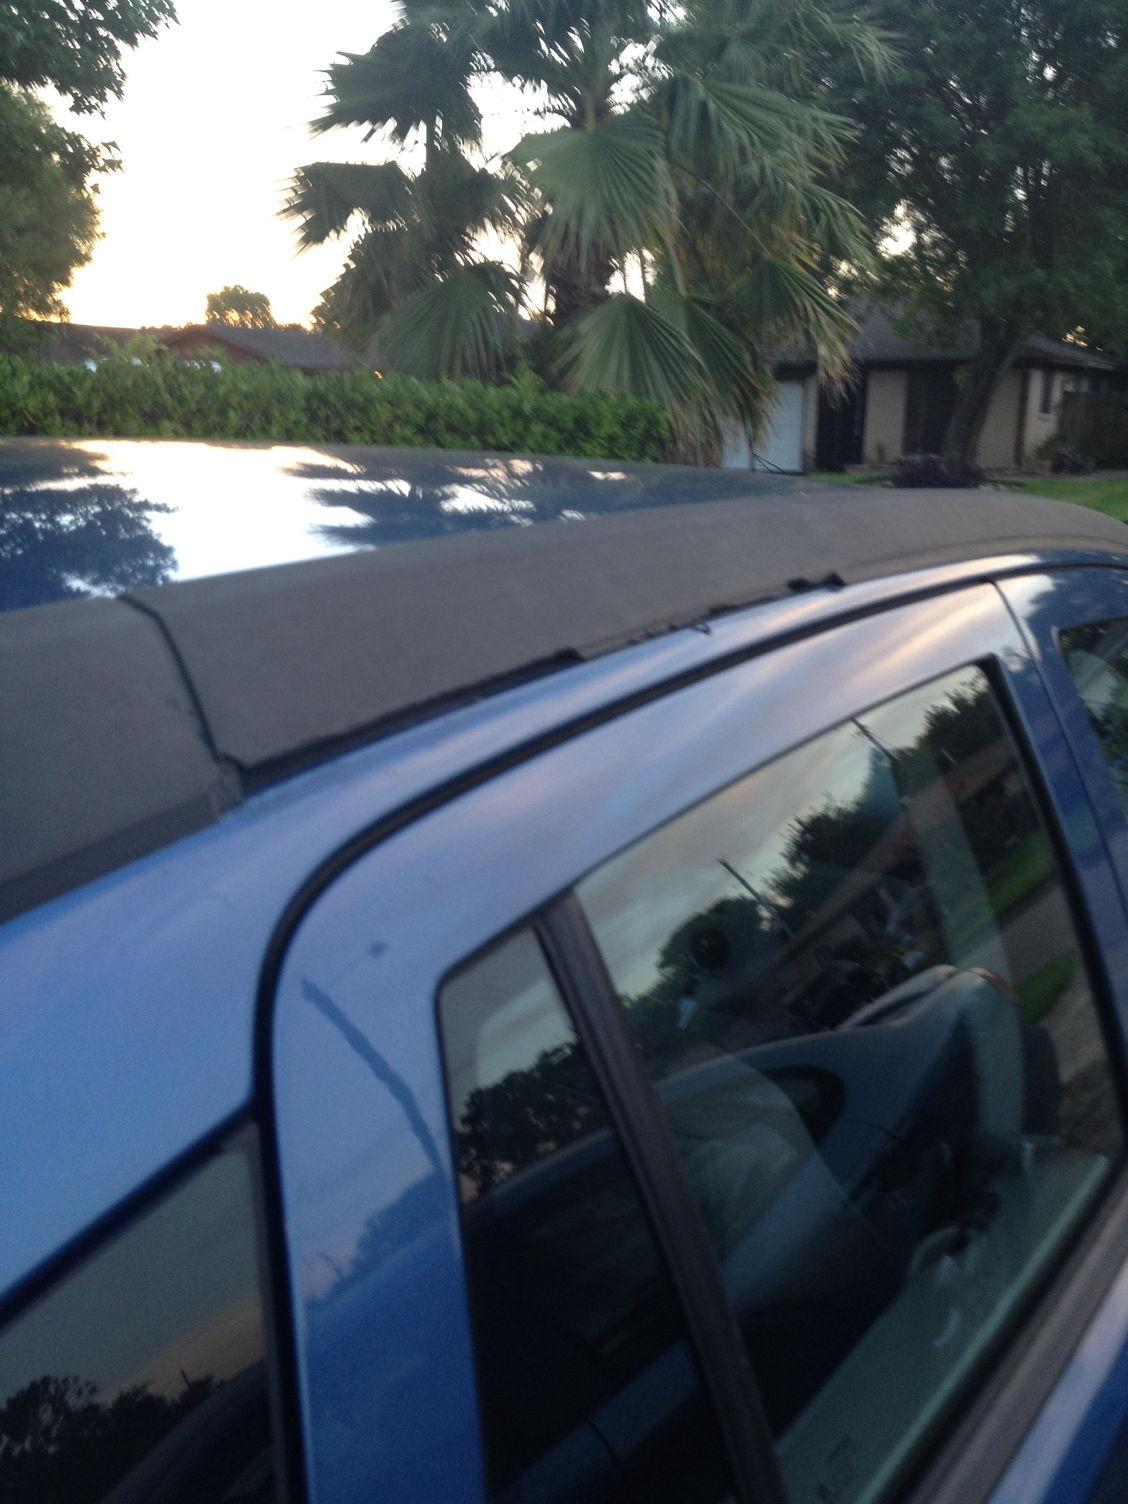 Car Ac Repair >> 07 caliber sxt roof molding cracking. - DodgeForum.com